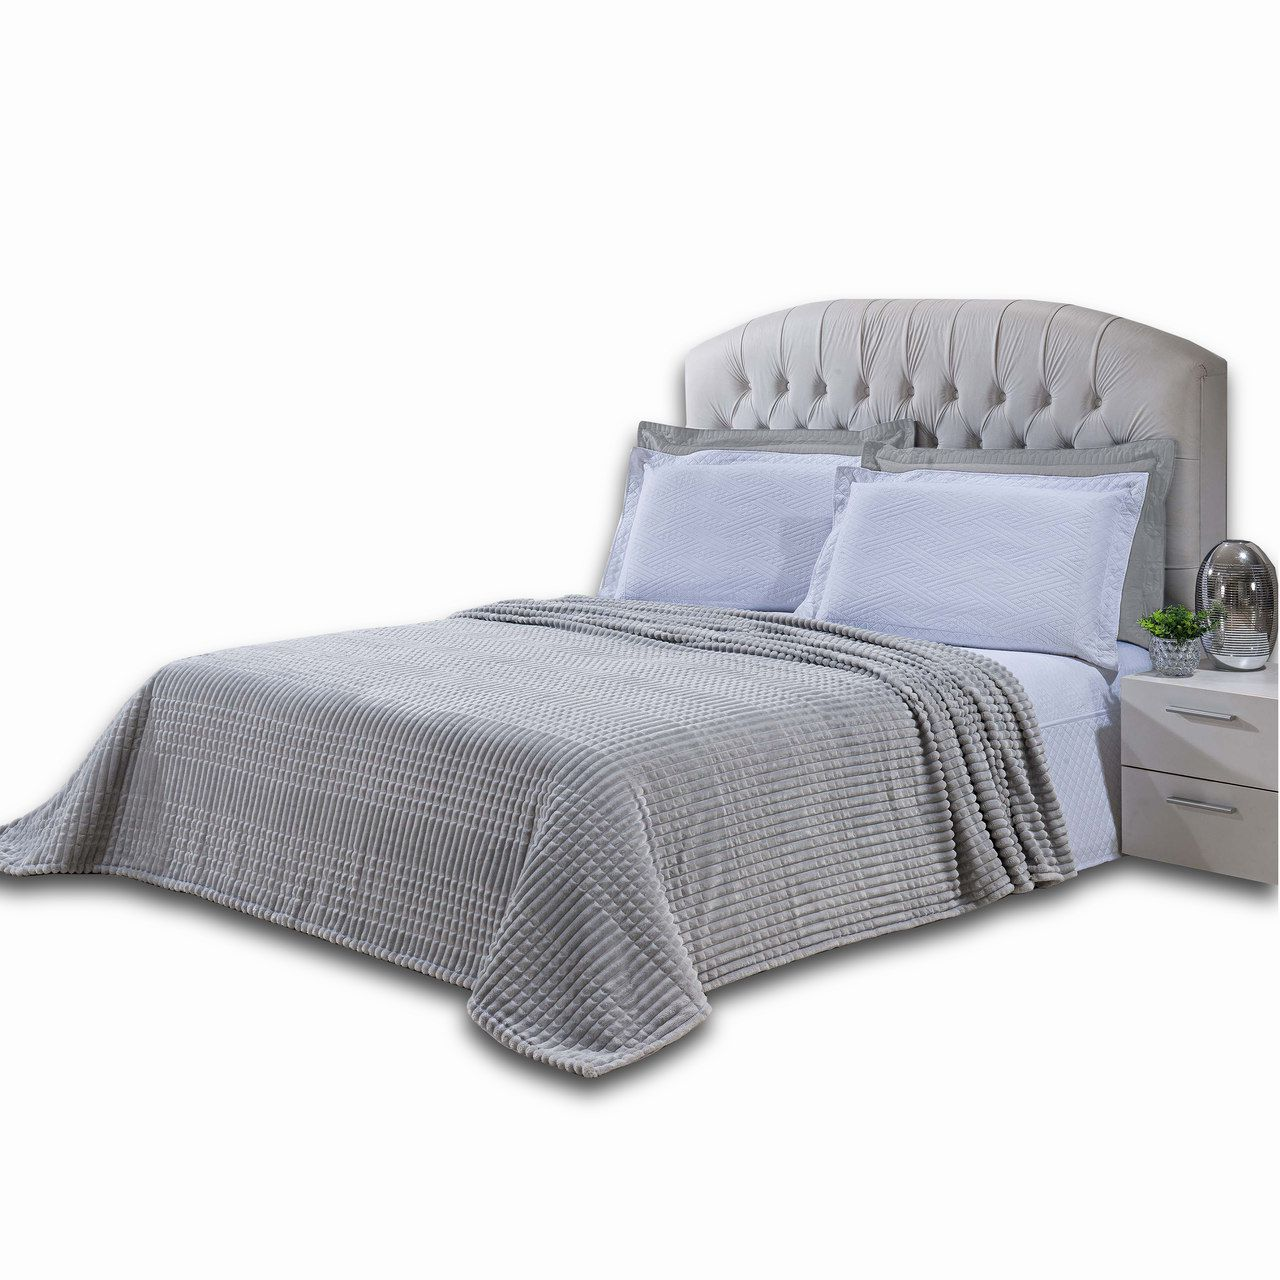 Cobertor Manta Flannel Casal Padrão Macio Alto Relevo Microfibra